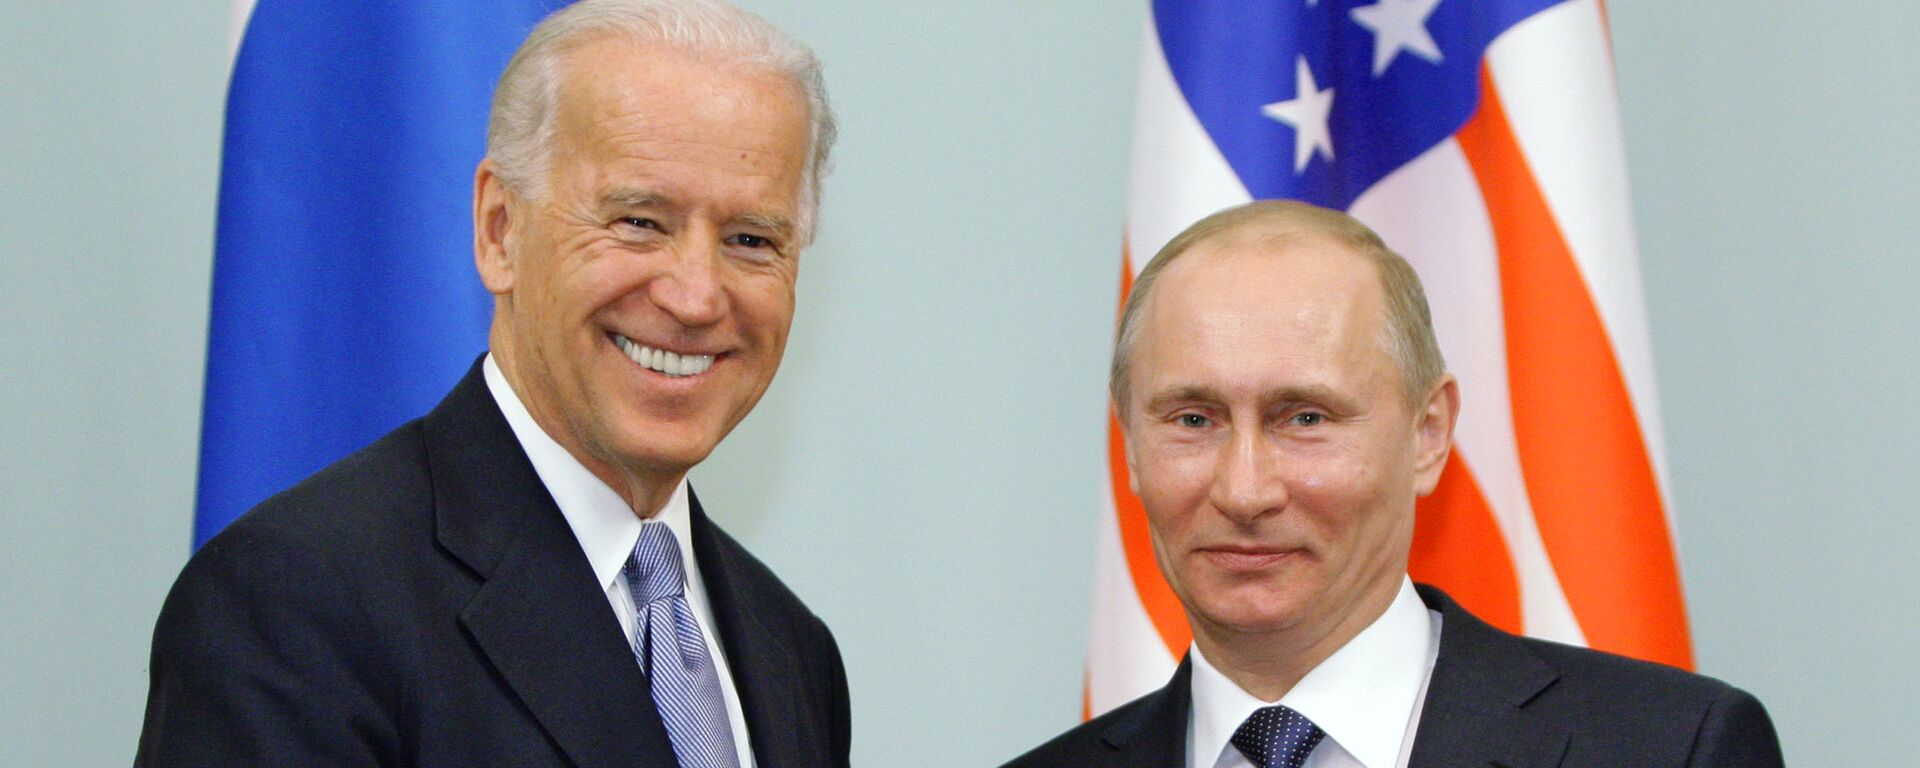 Президент РФ Владимир Путин и президент США Джо Байден - Sputnik Тоҷикистон, 1920, 14.04.2021